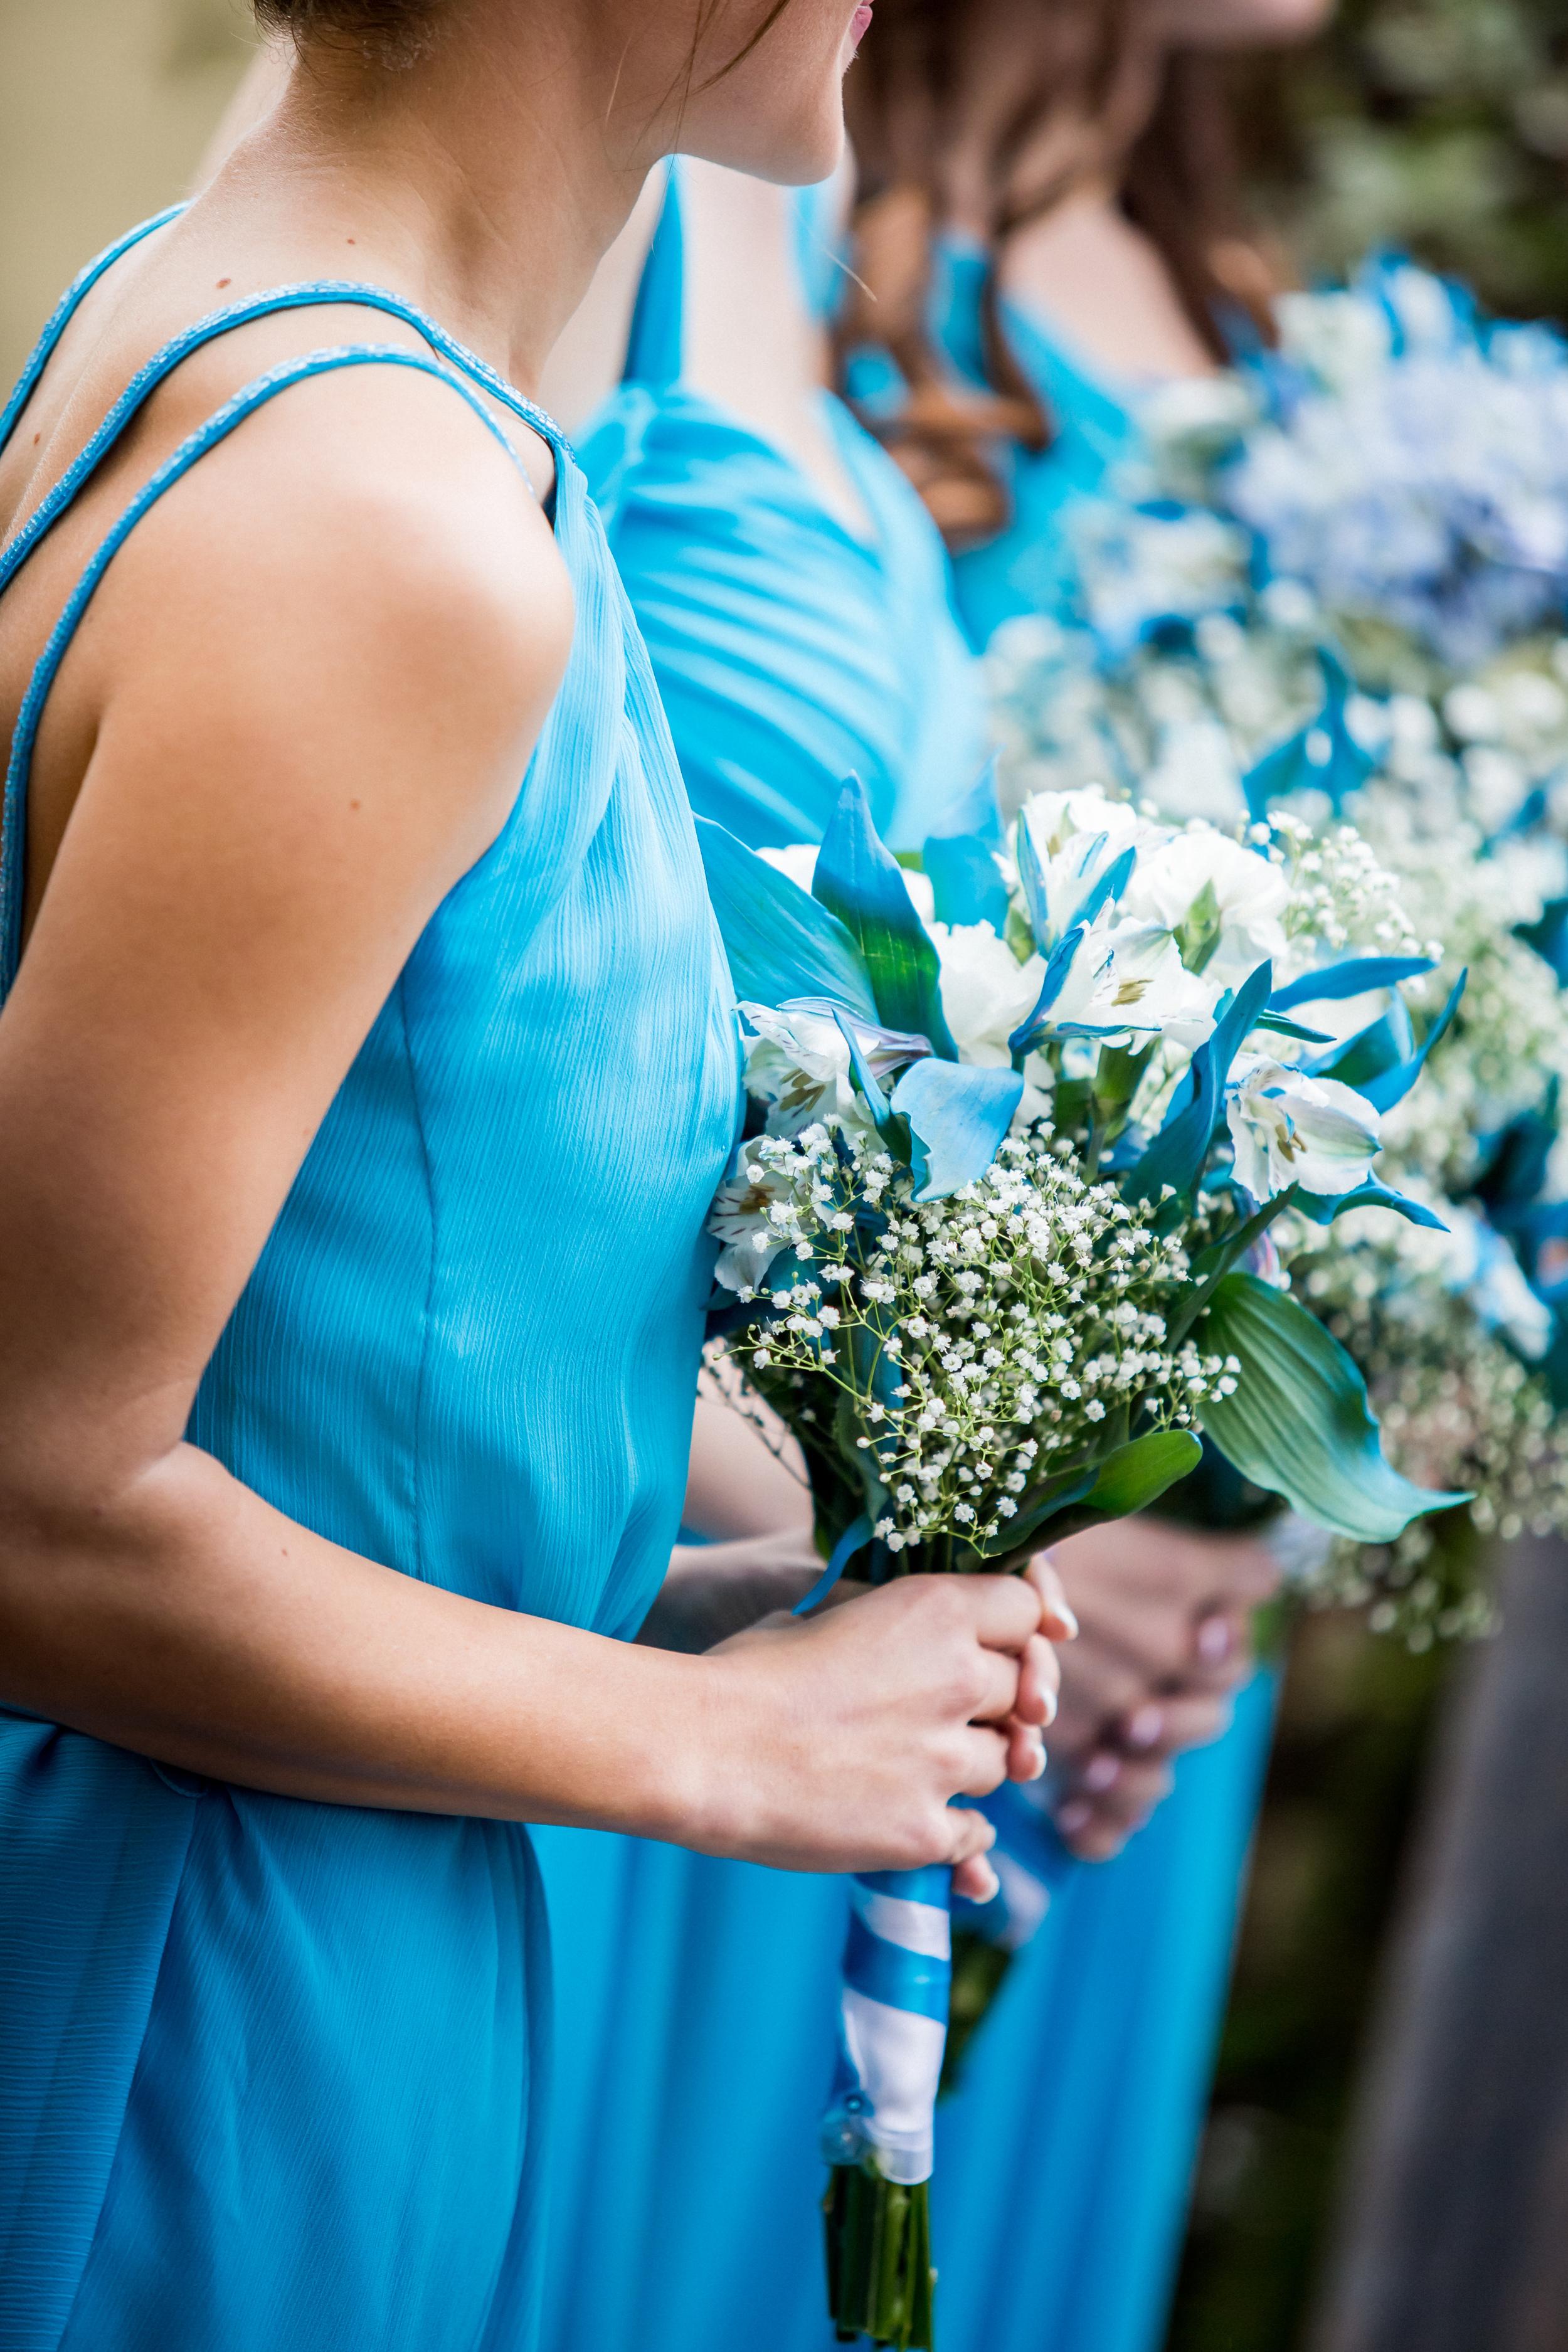 Sky blue wedding bouquet, with white alstromerias, baby's breath, and blue flower petals.